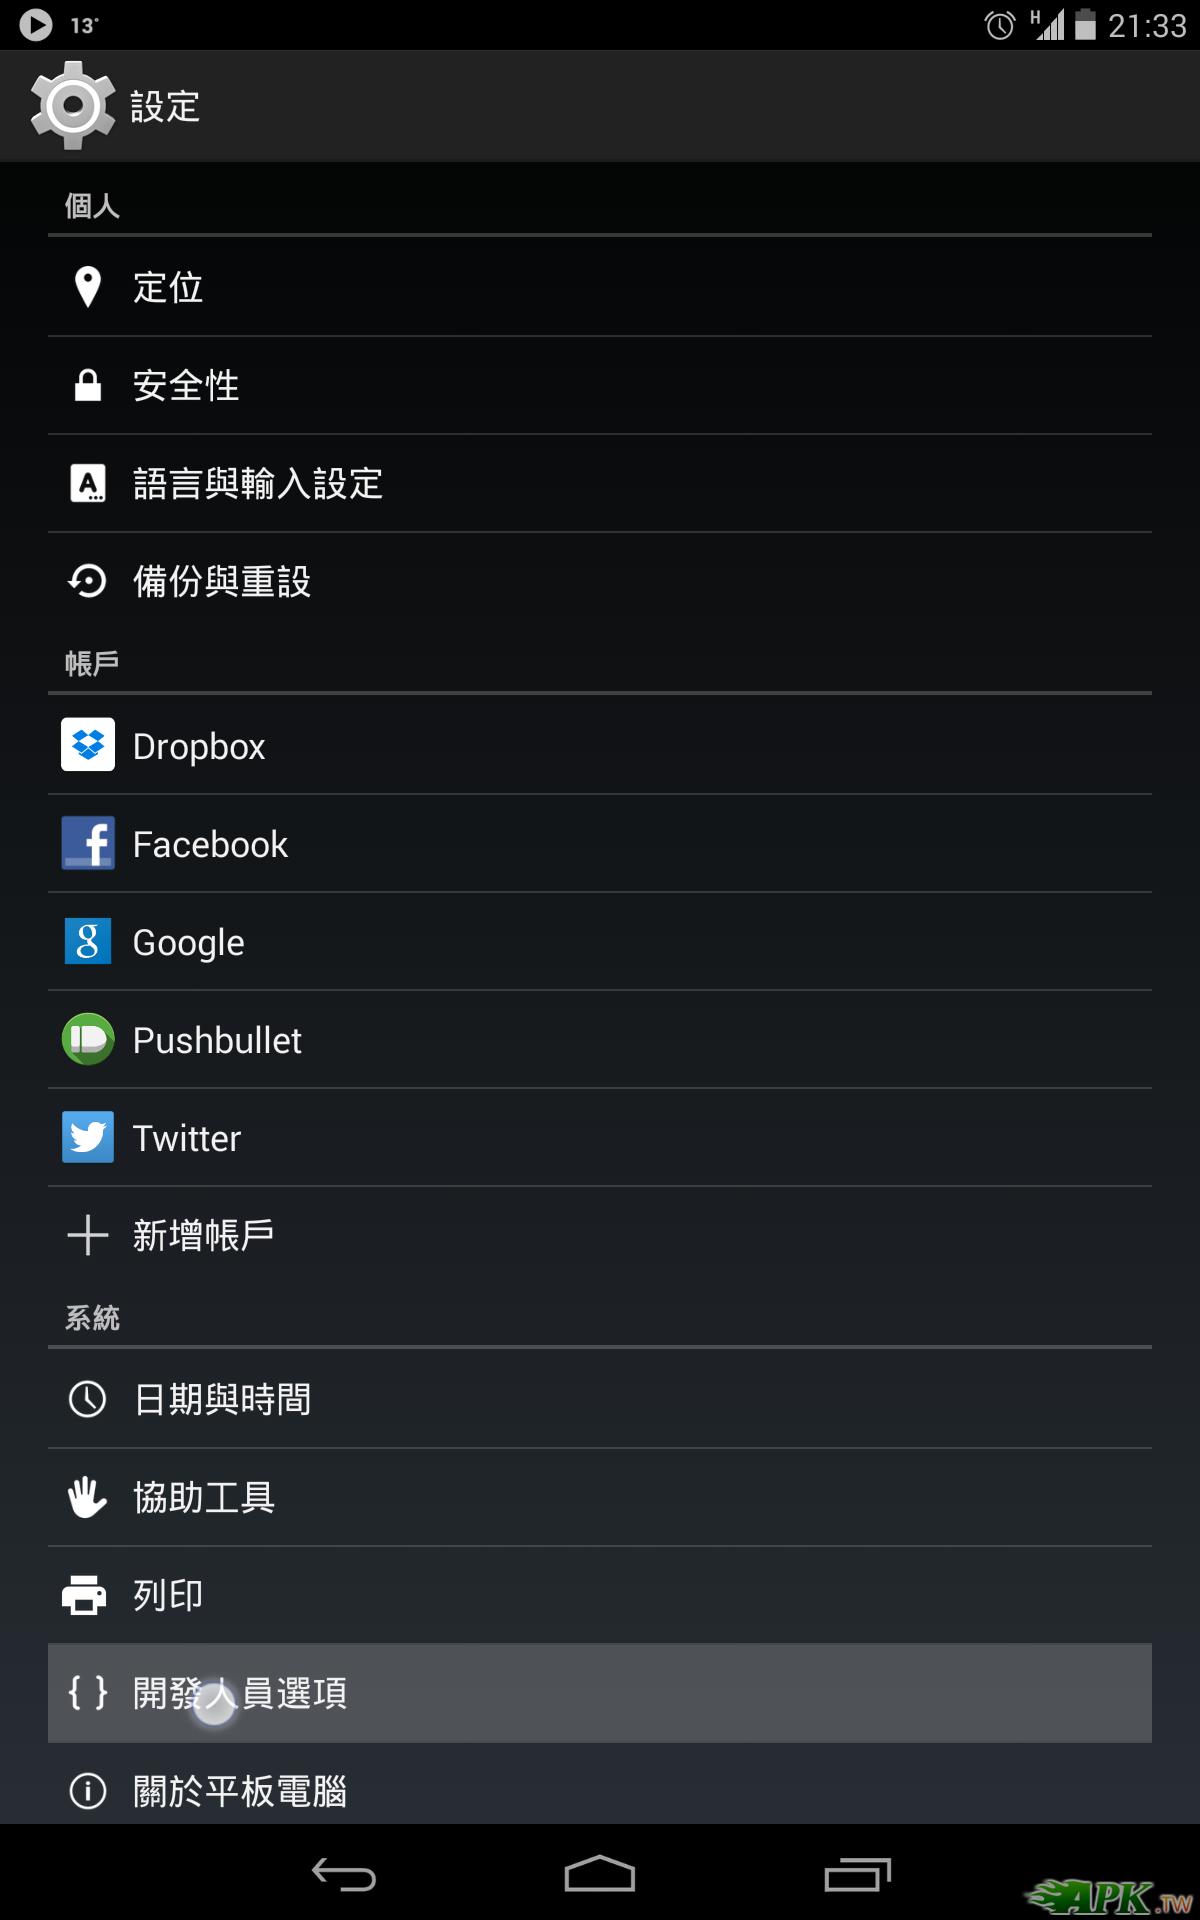 Screenshot_2014-03-13-21-33-06.png